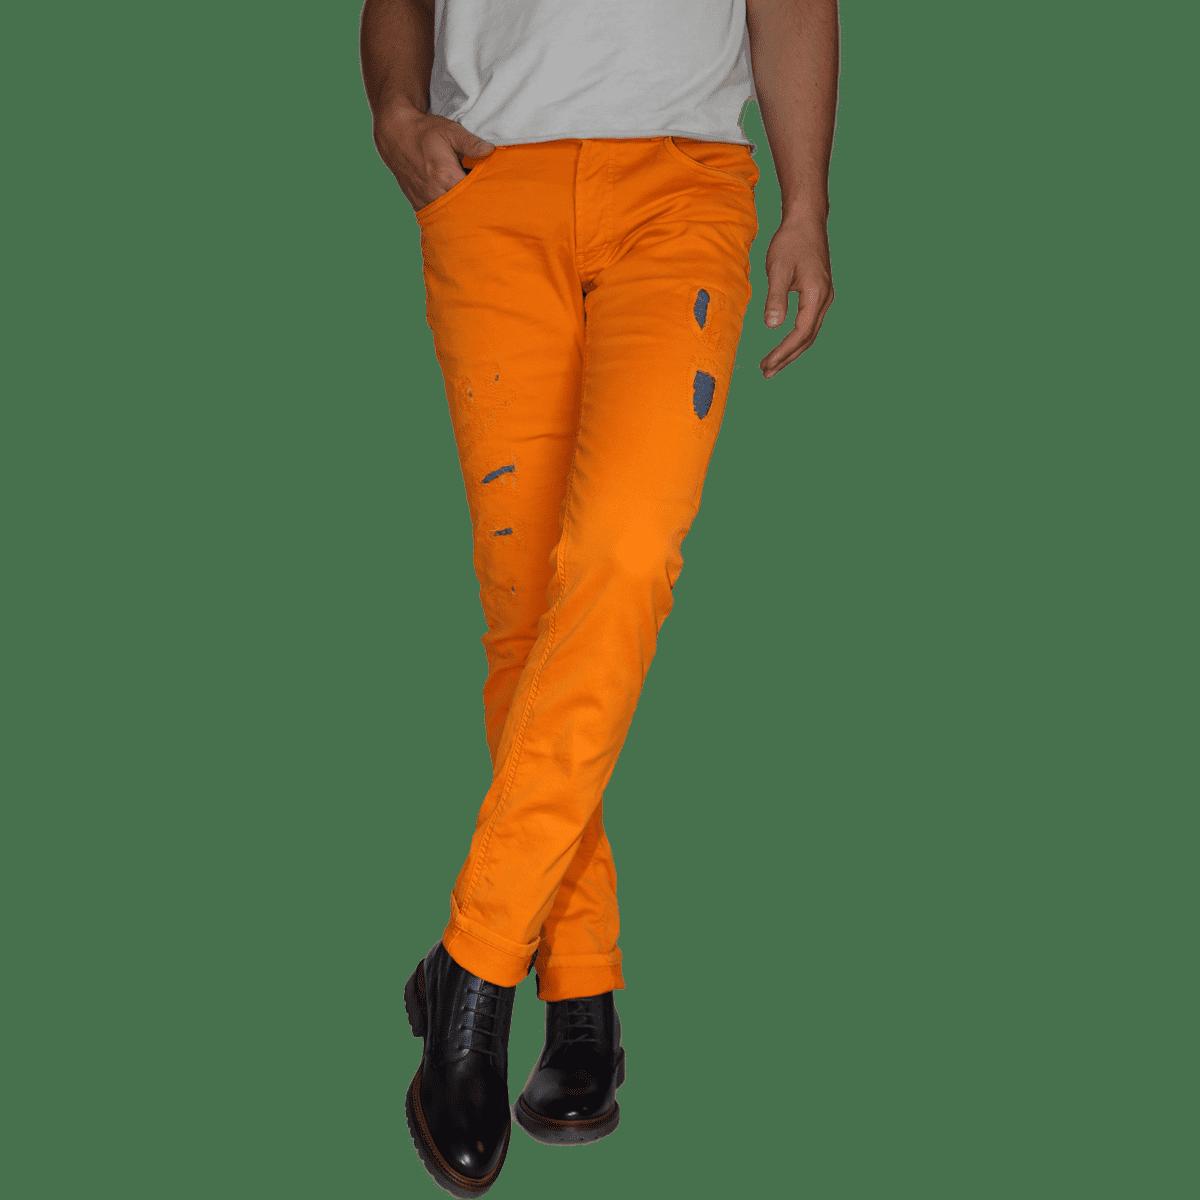 Cabinero Stiles Berlin PG Enjoy Jeans, Herrenhosen, made in Italy AW17-18 denim curry blue 3